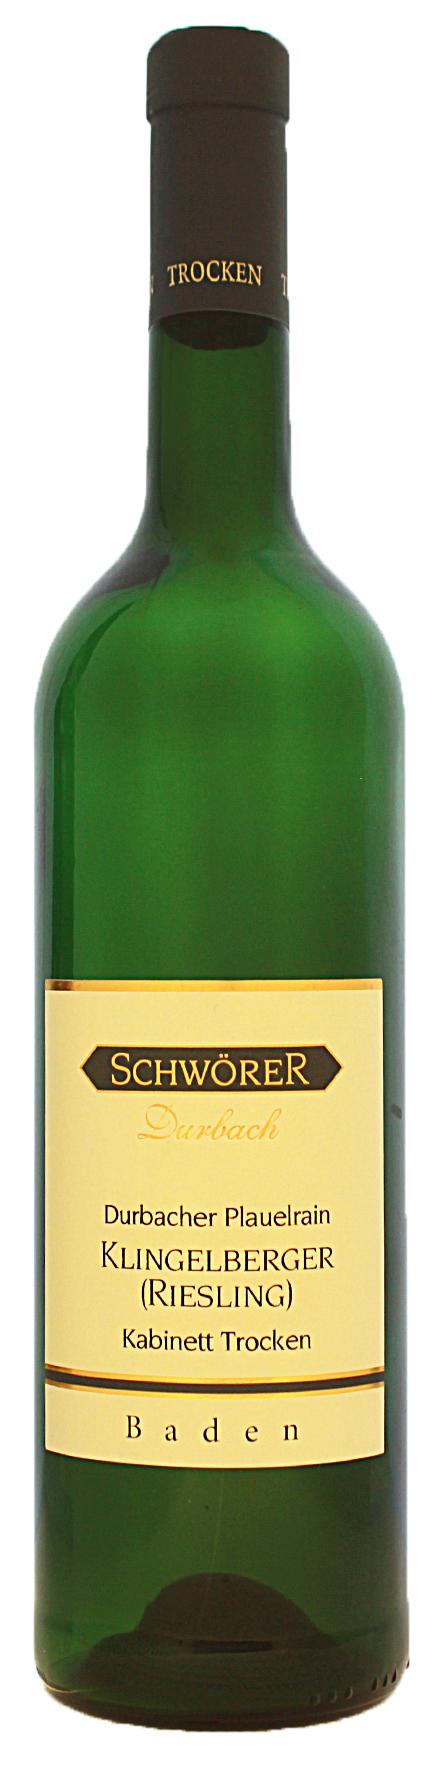 Durbacher Plauelrain Riesling KabInett trocken Weingut Schwörer Durbach 2020